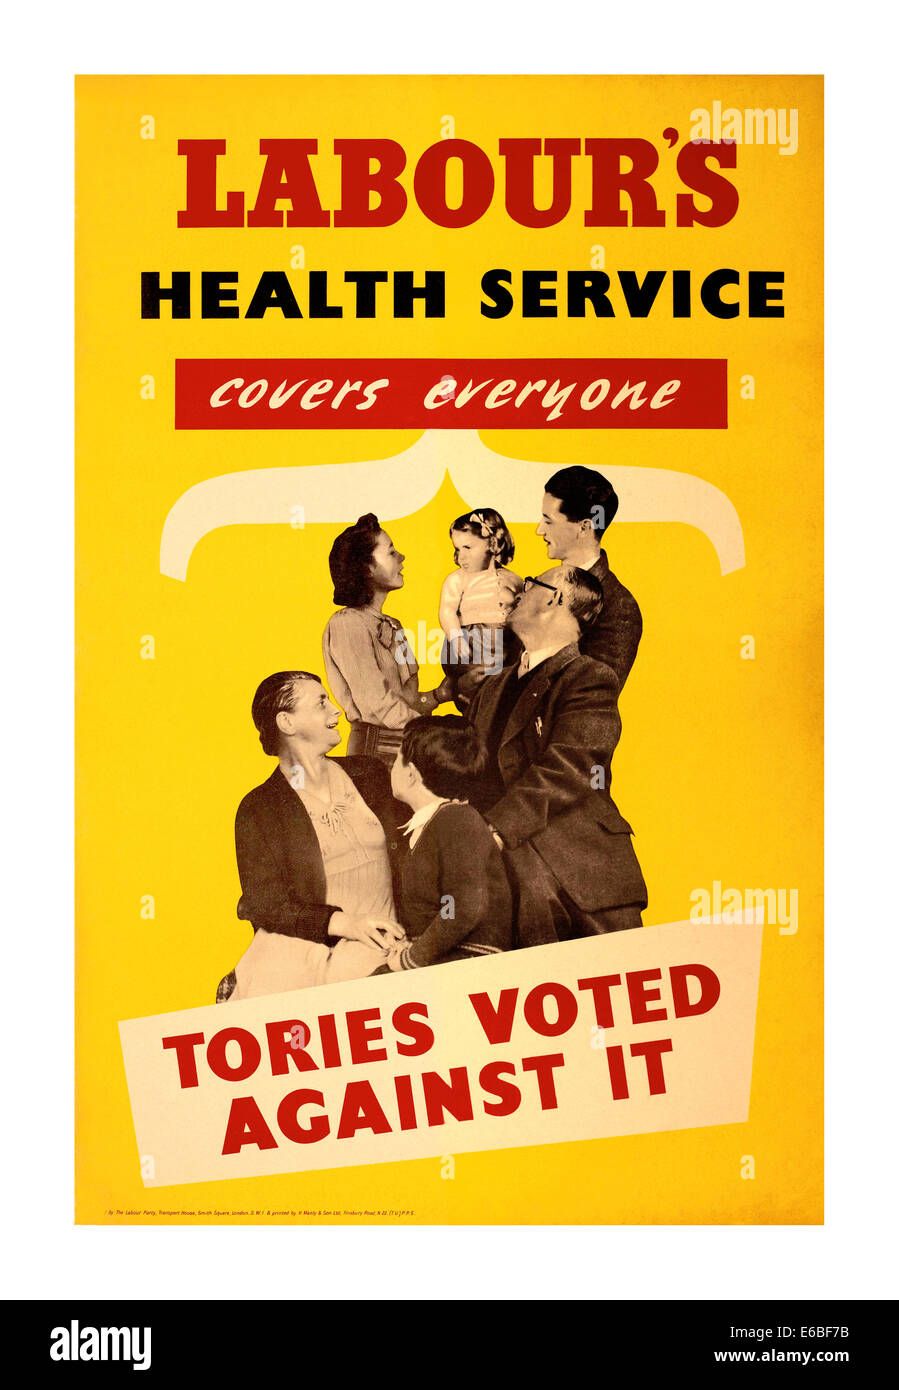 Vintage 1948 post war UK poster promoting Labour's Health Service initiative - Stock Image